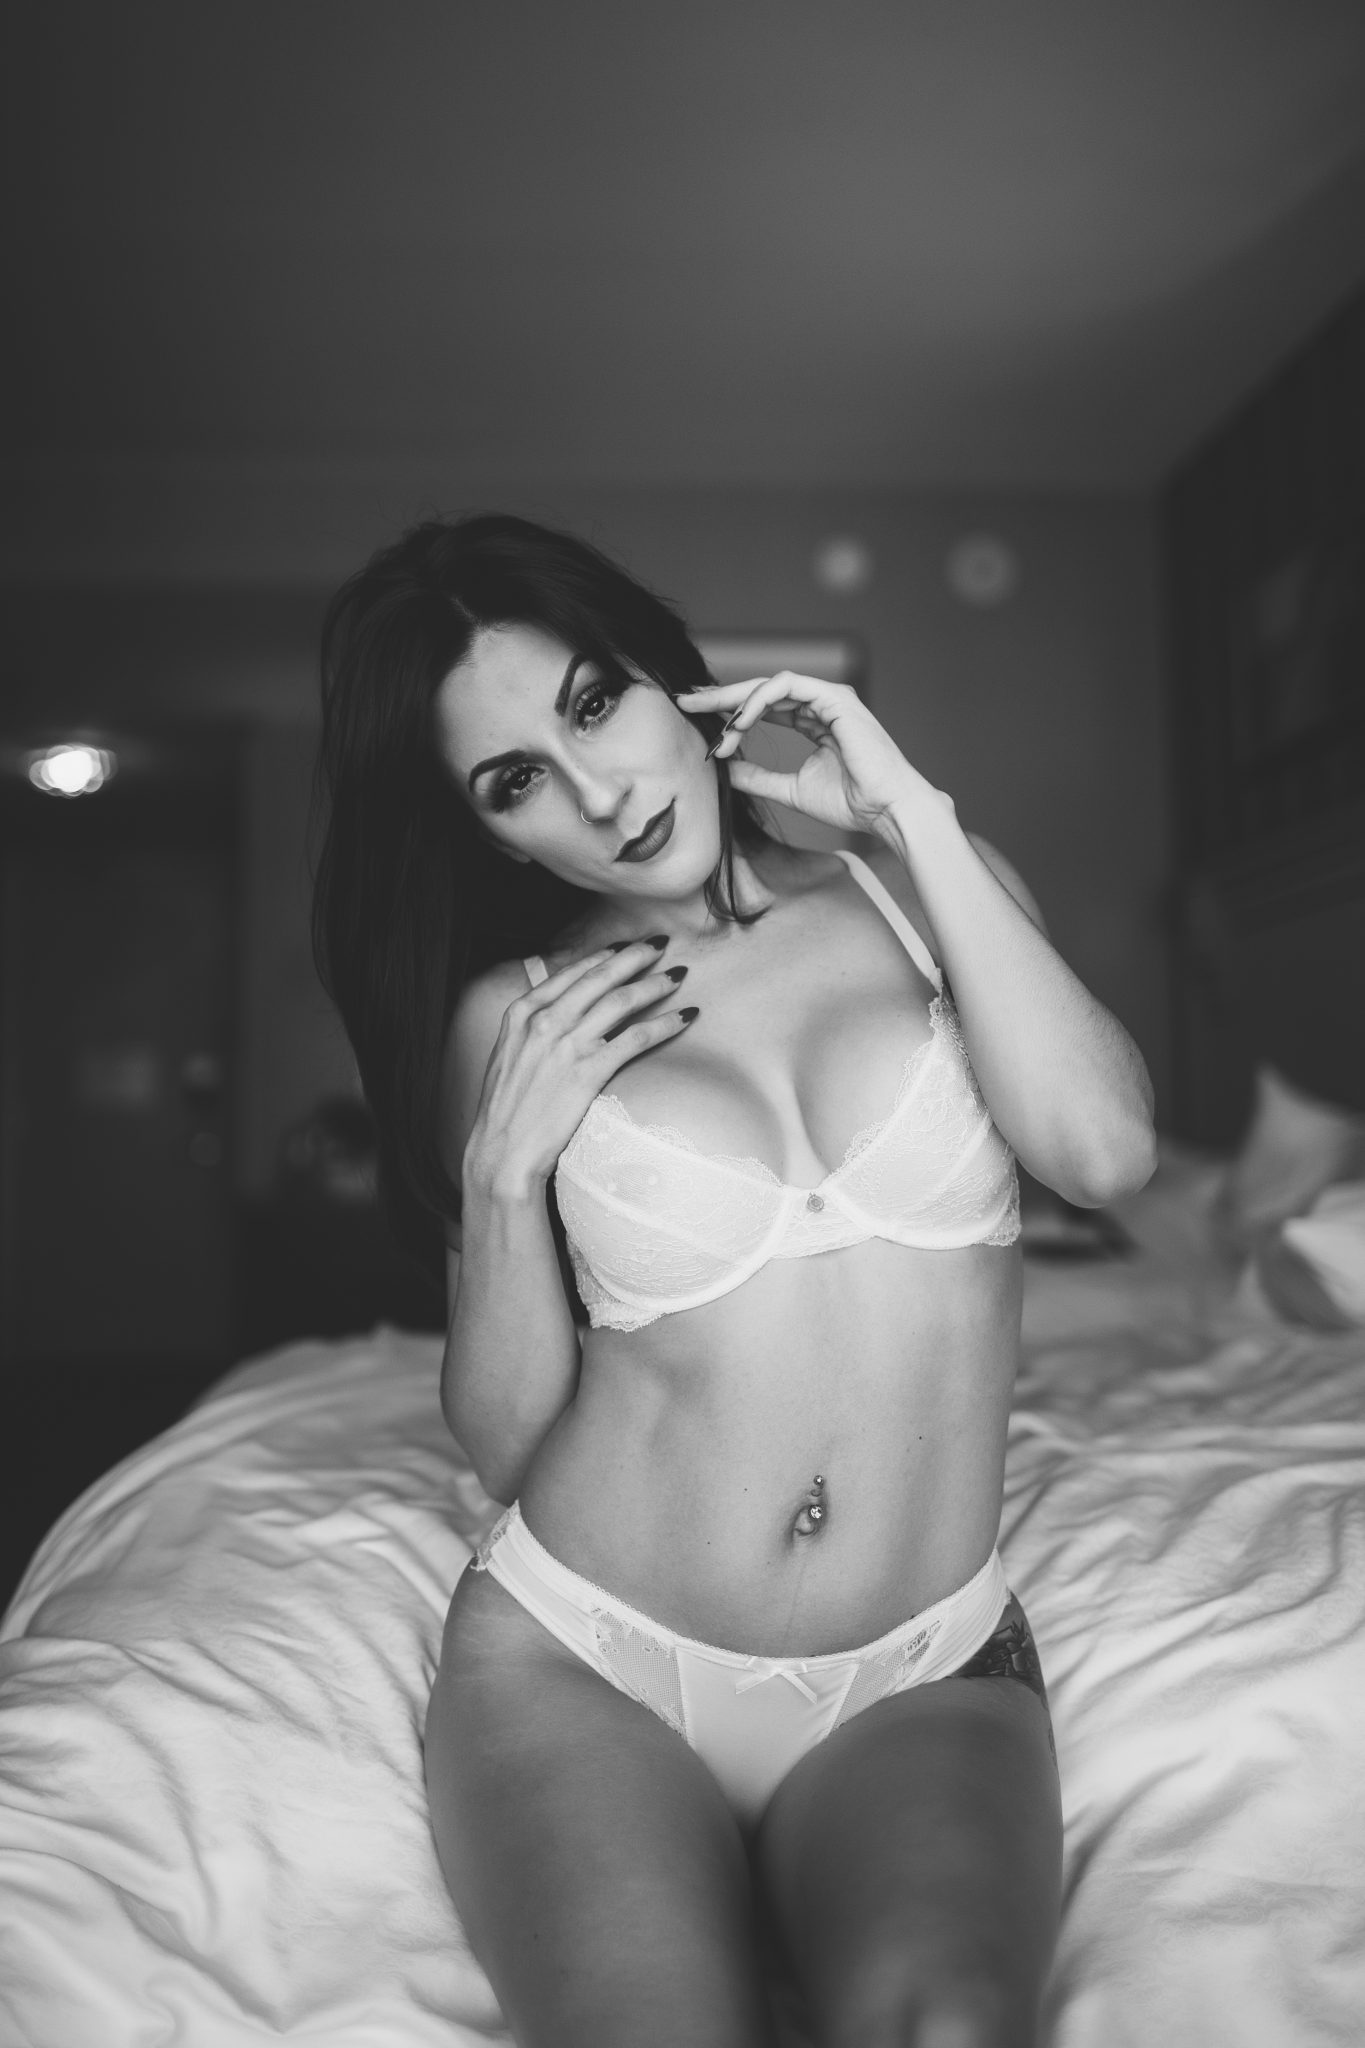 A sensual pose at a NY hotel room photoshoot